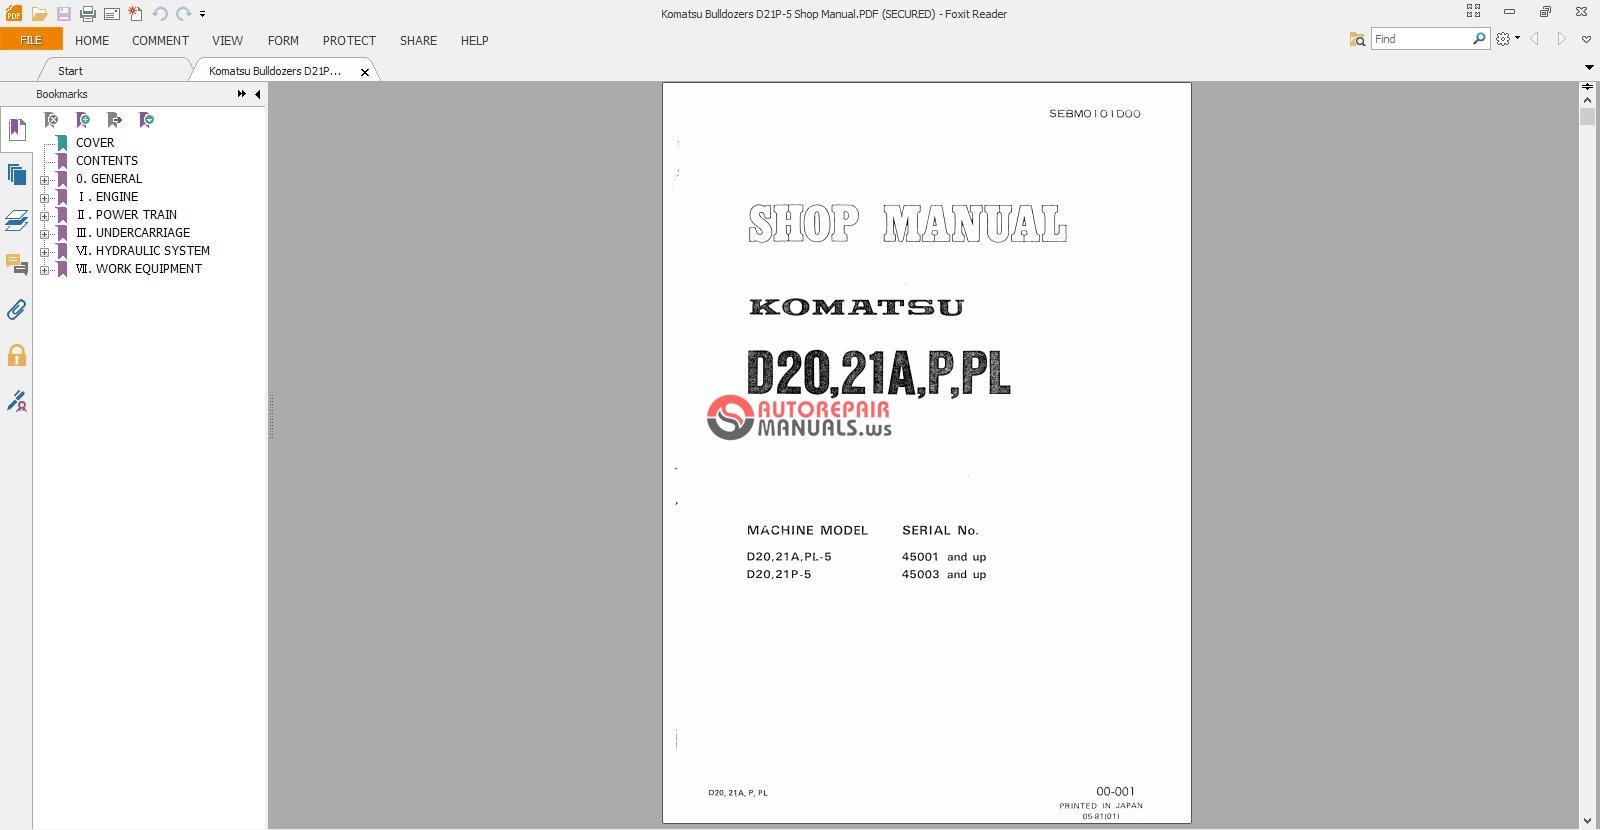 Komatsu Bulldozers D21p